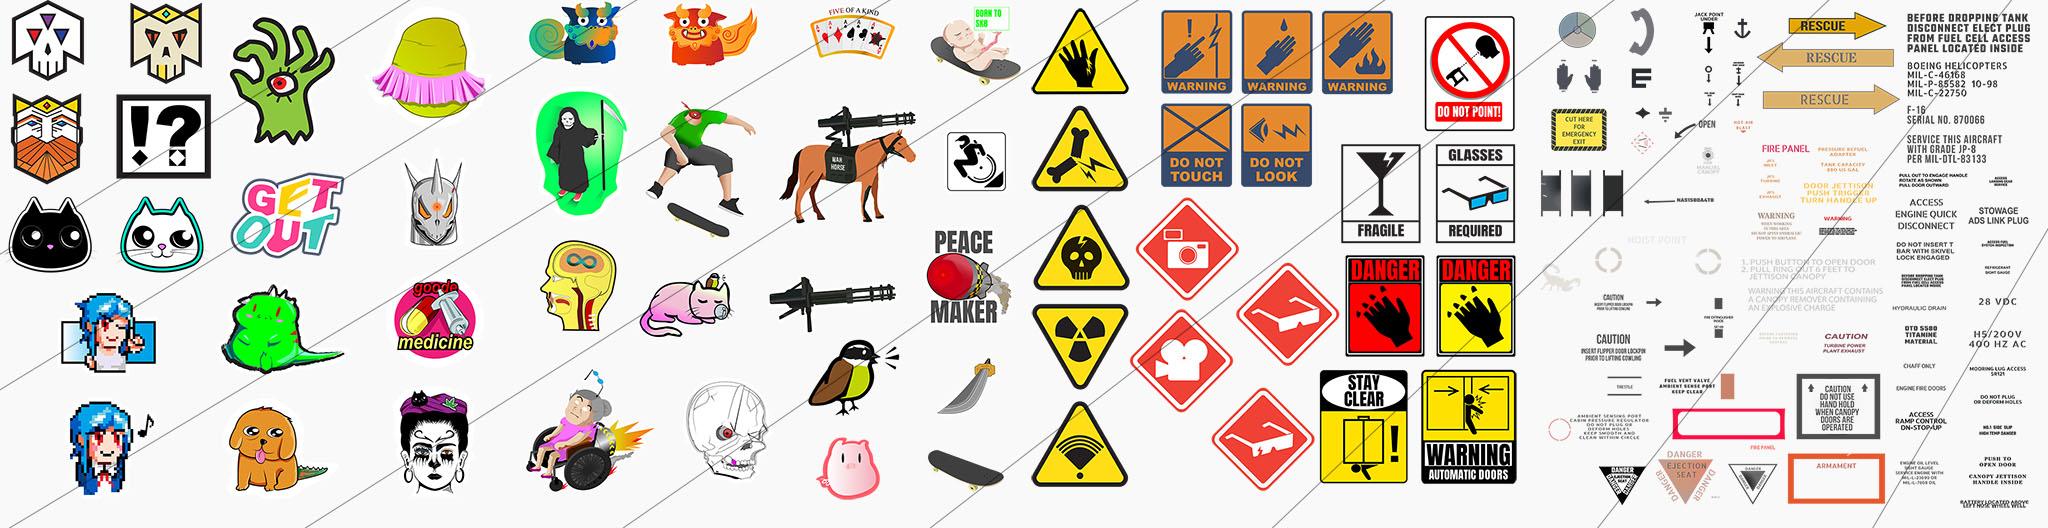 Tcom_Graphic_StickerSet.jpg